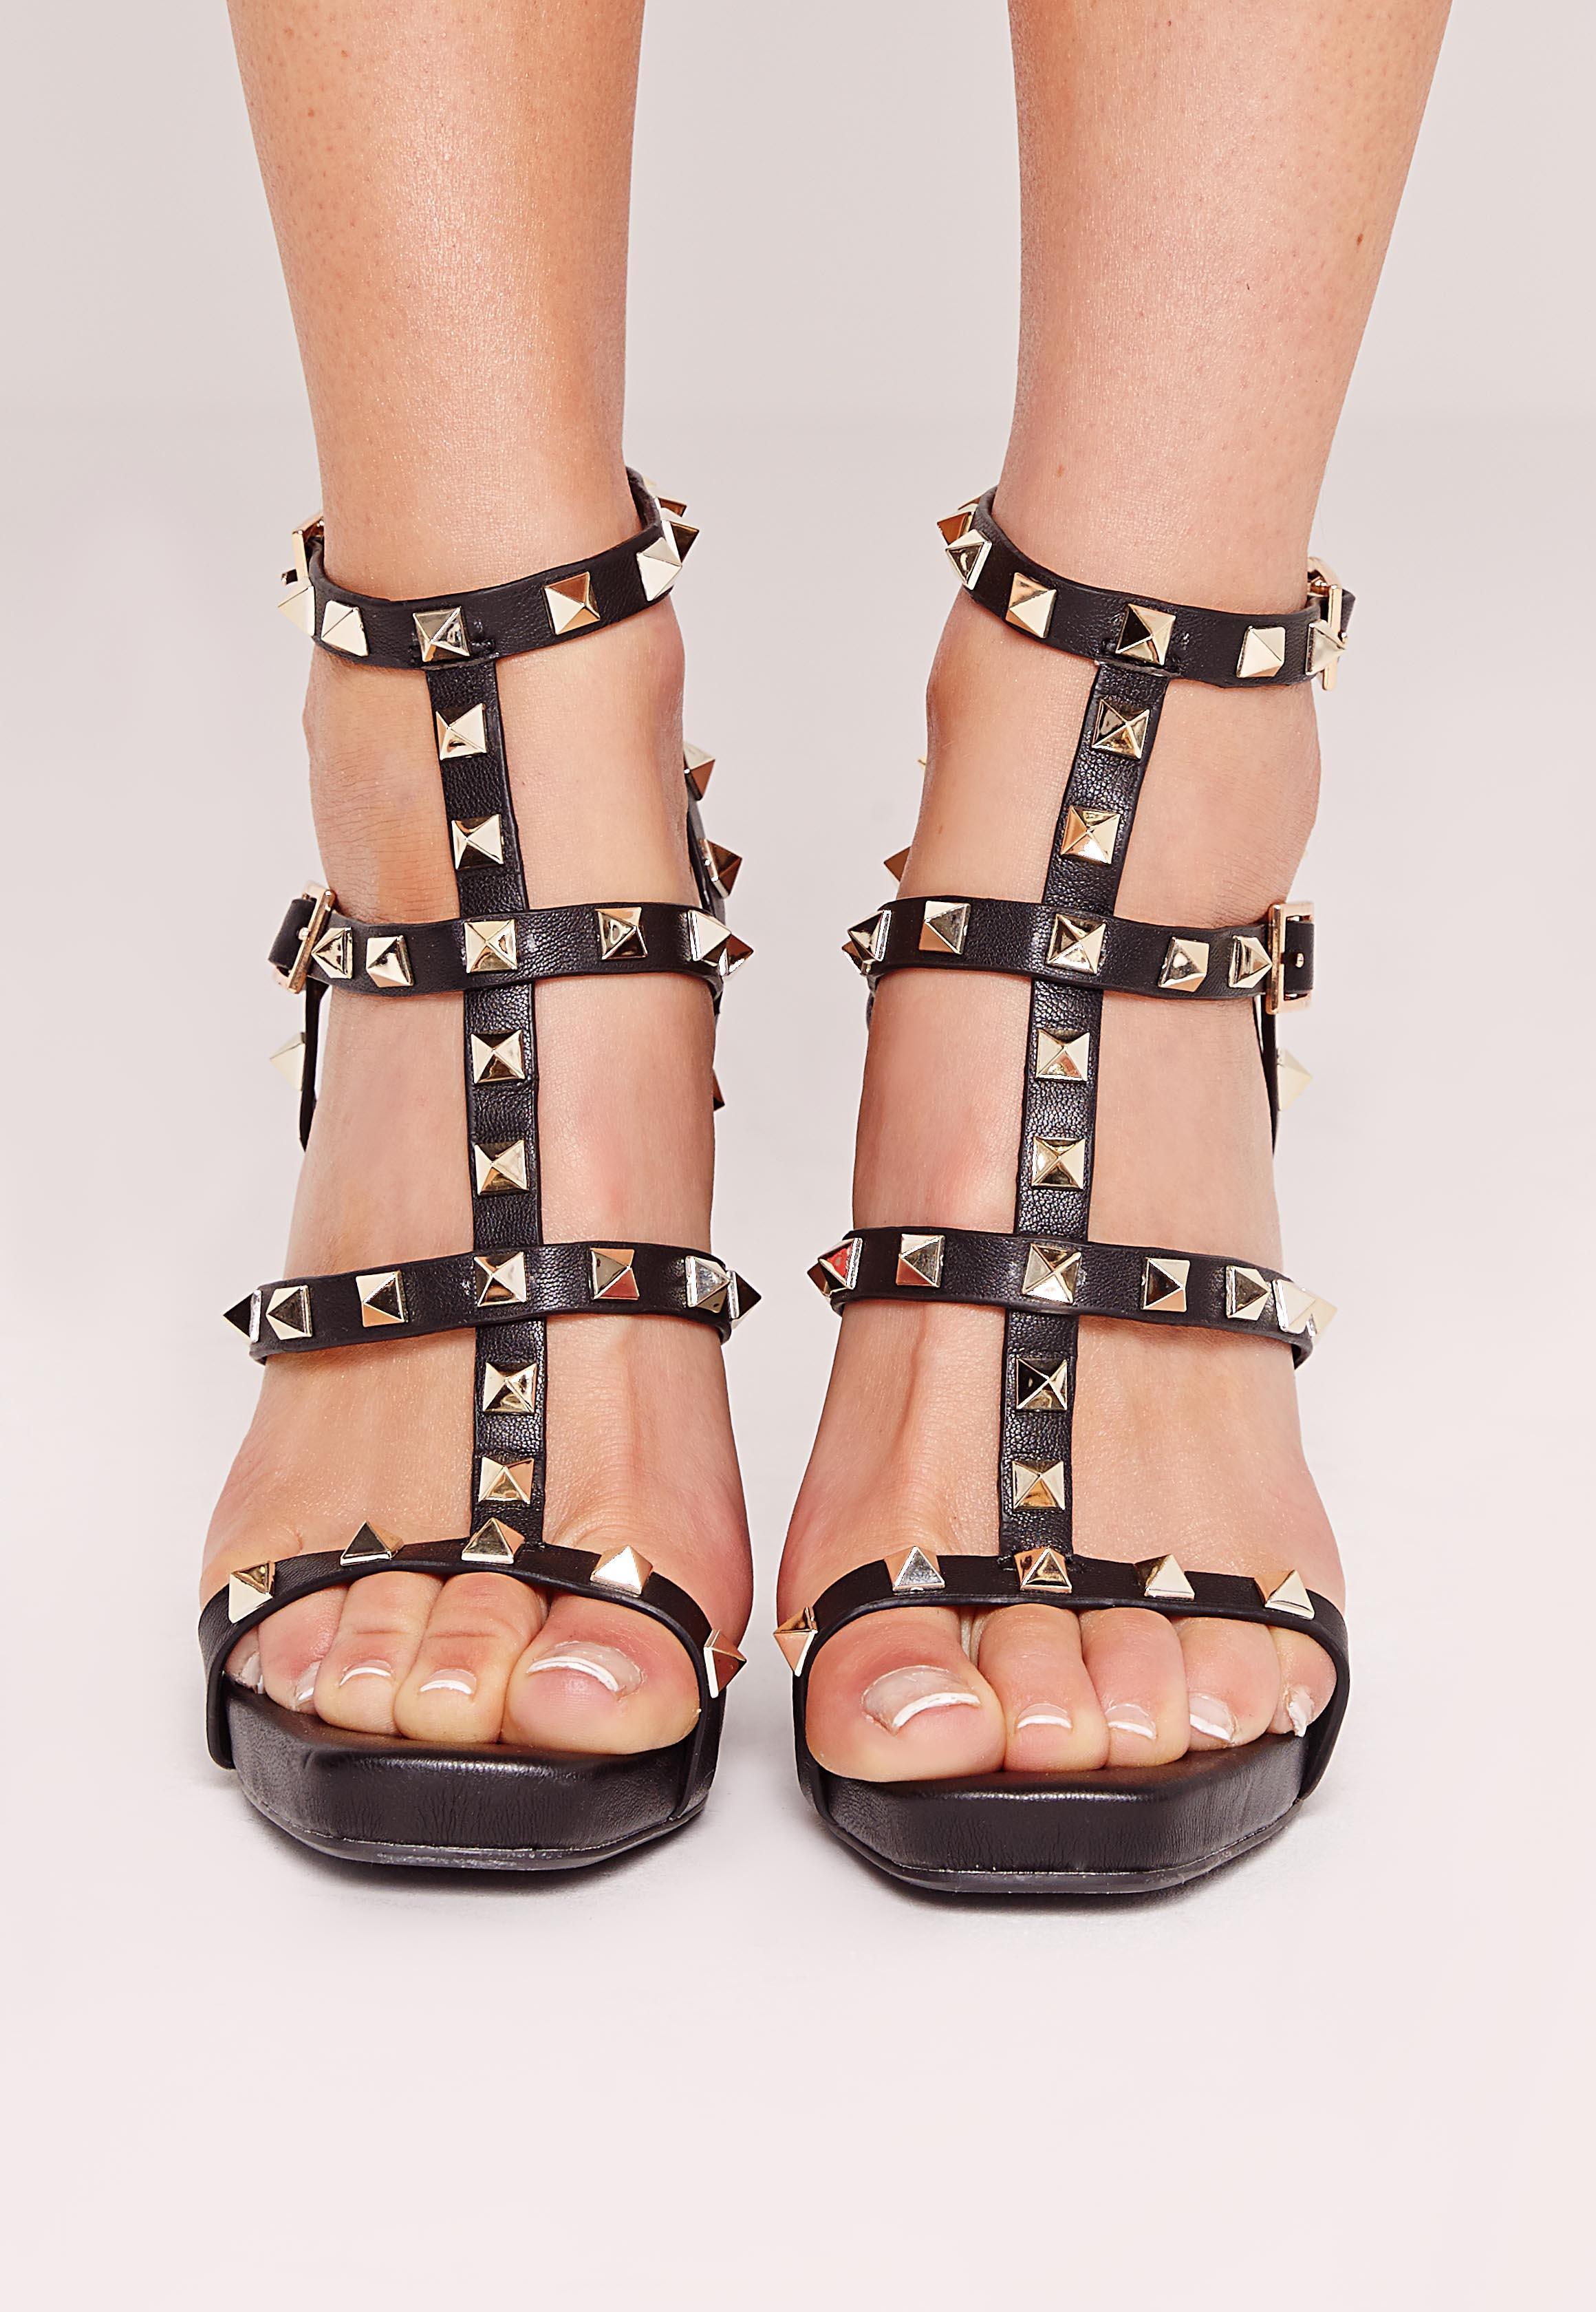 Cons of black strappy heels - fashionarrow.com